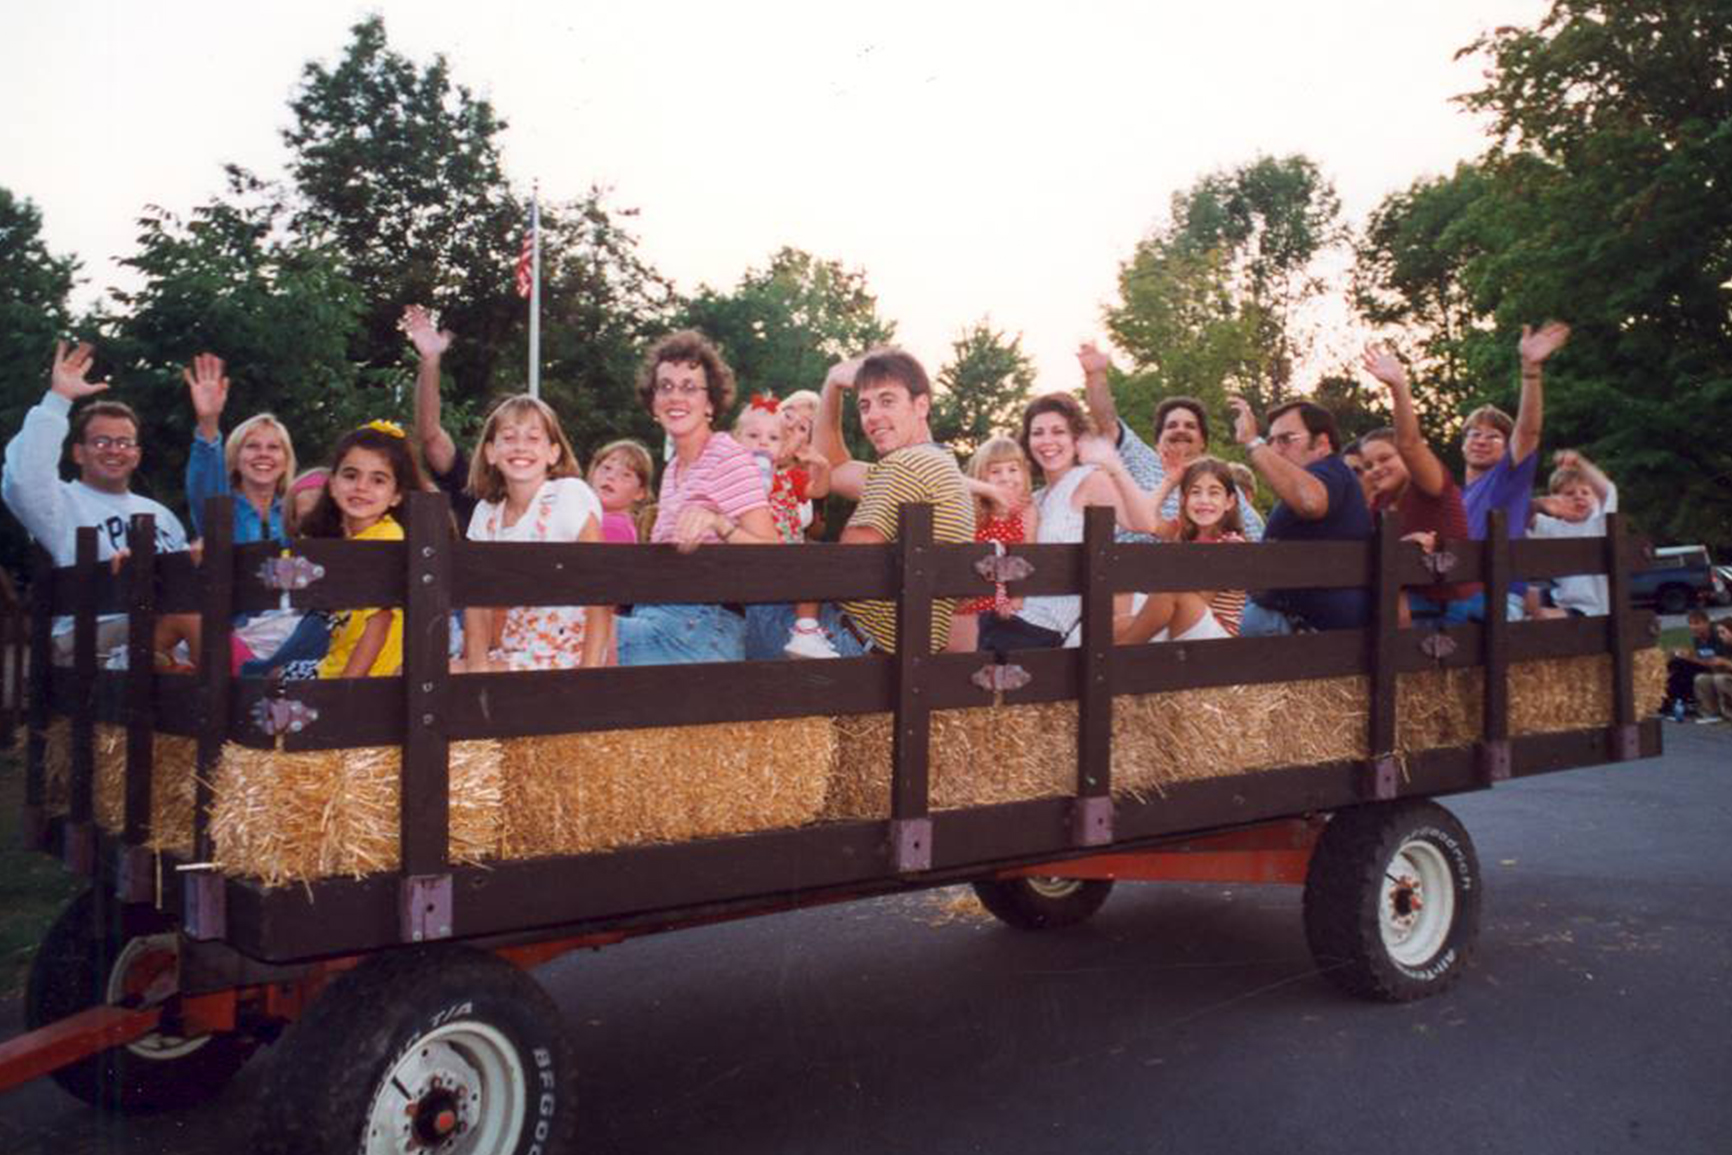 Family-Friendly Wagon Rides